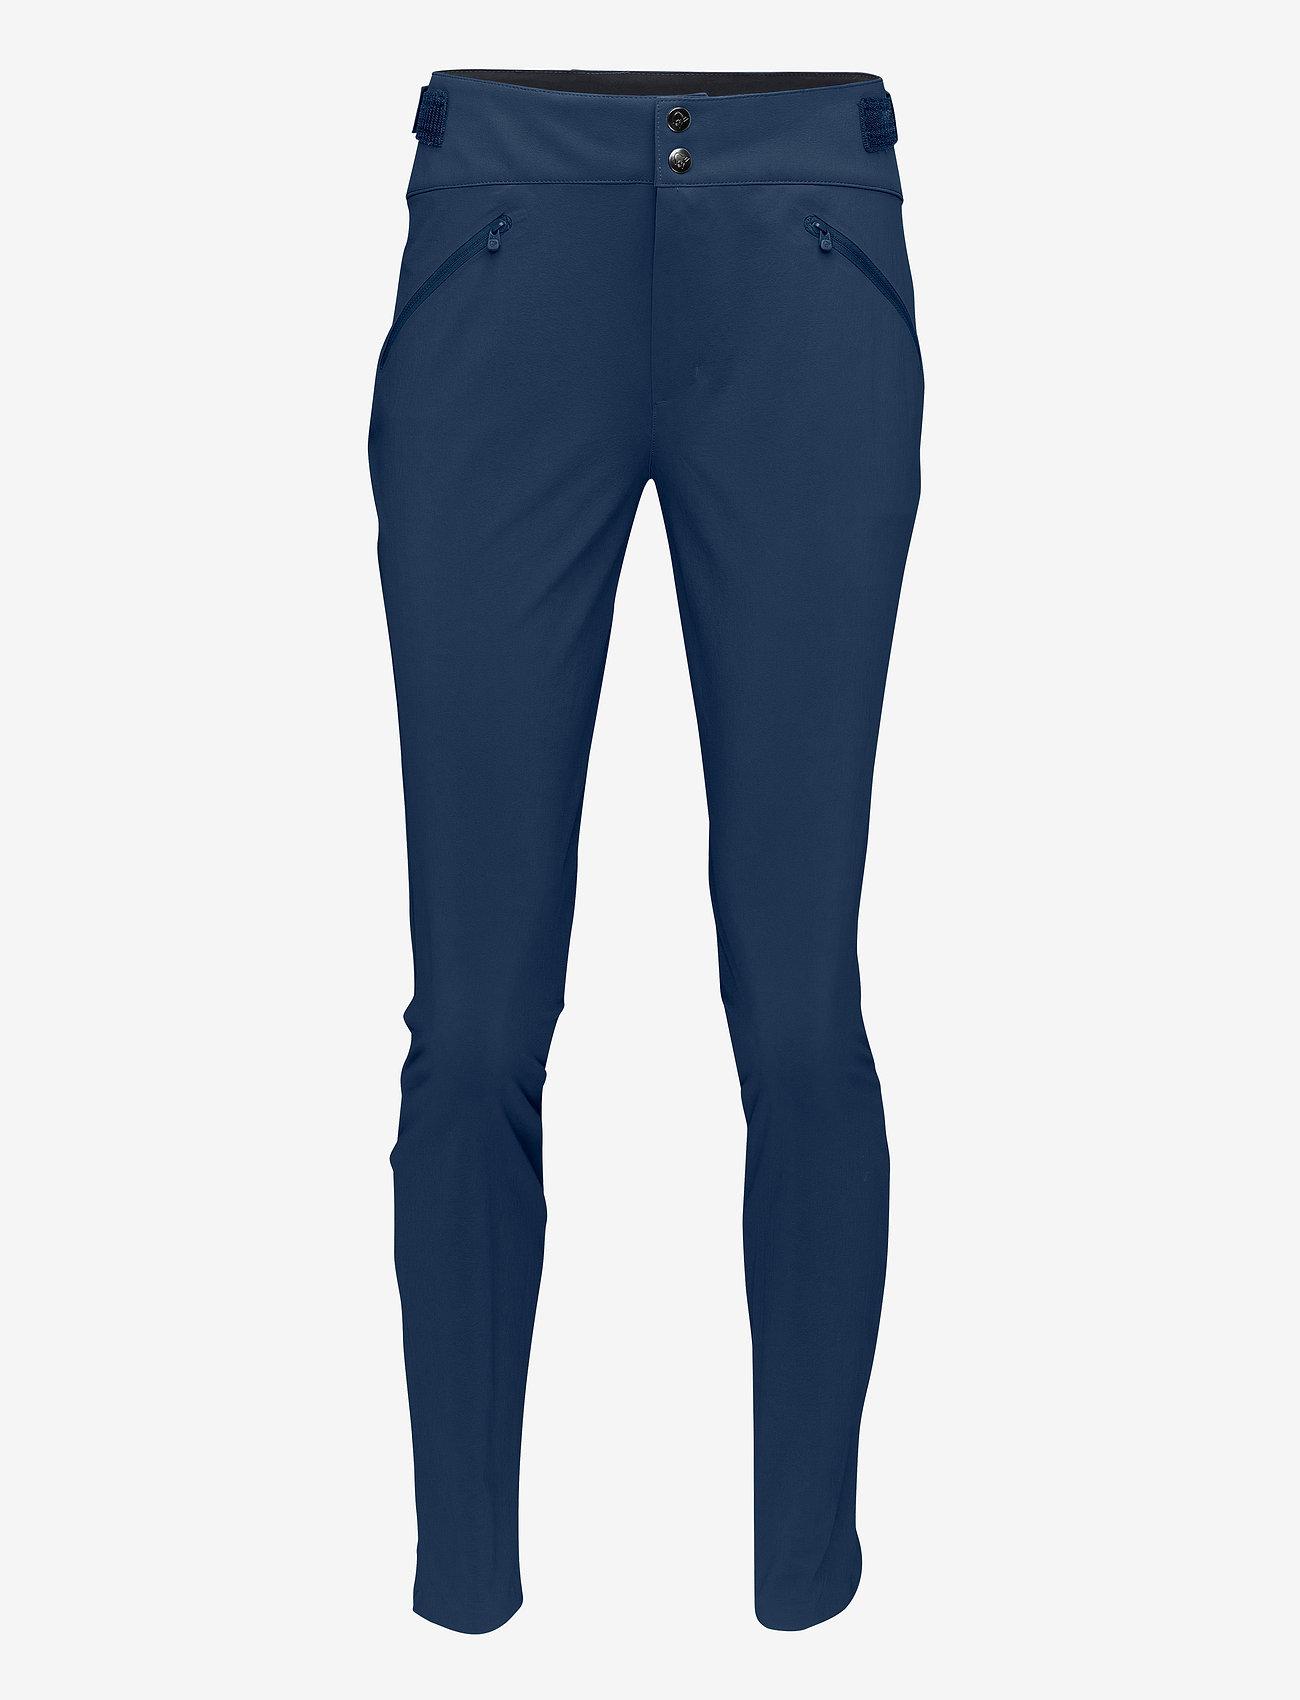 Norrøna - falketind flex1 slim Pants W's - friluftsbukser - indigo night - 0